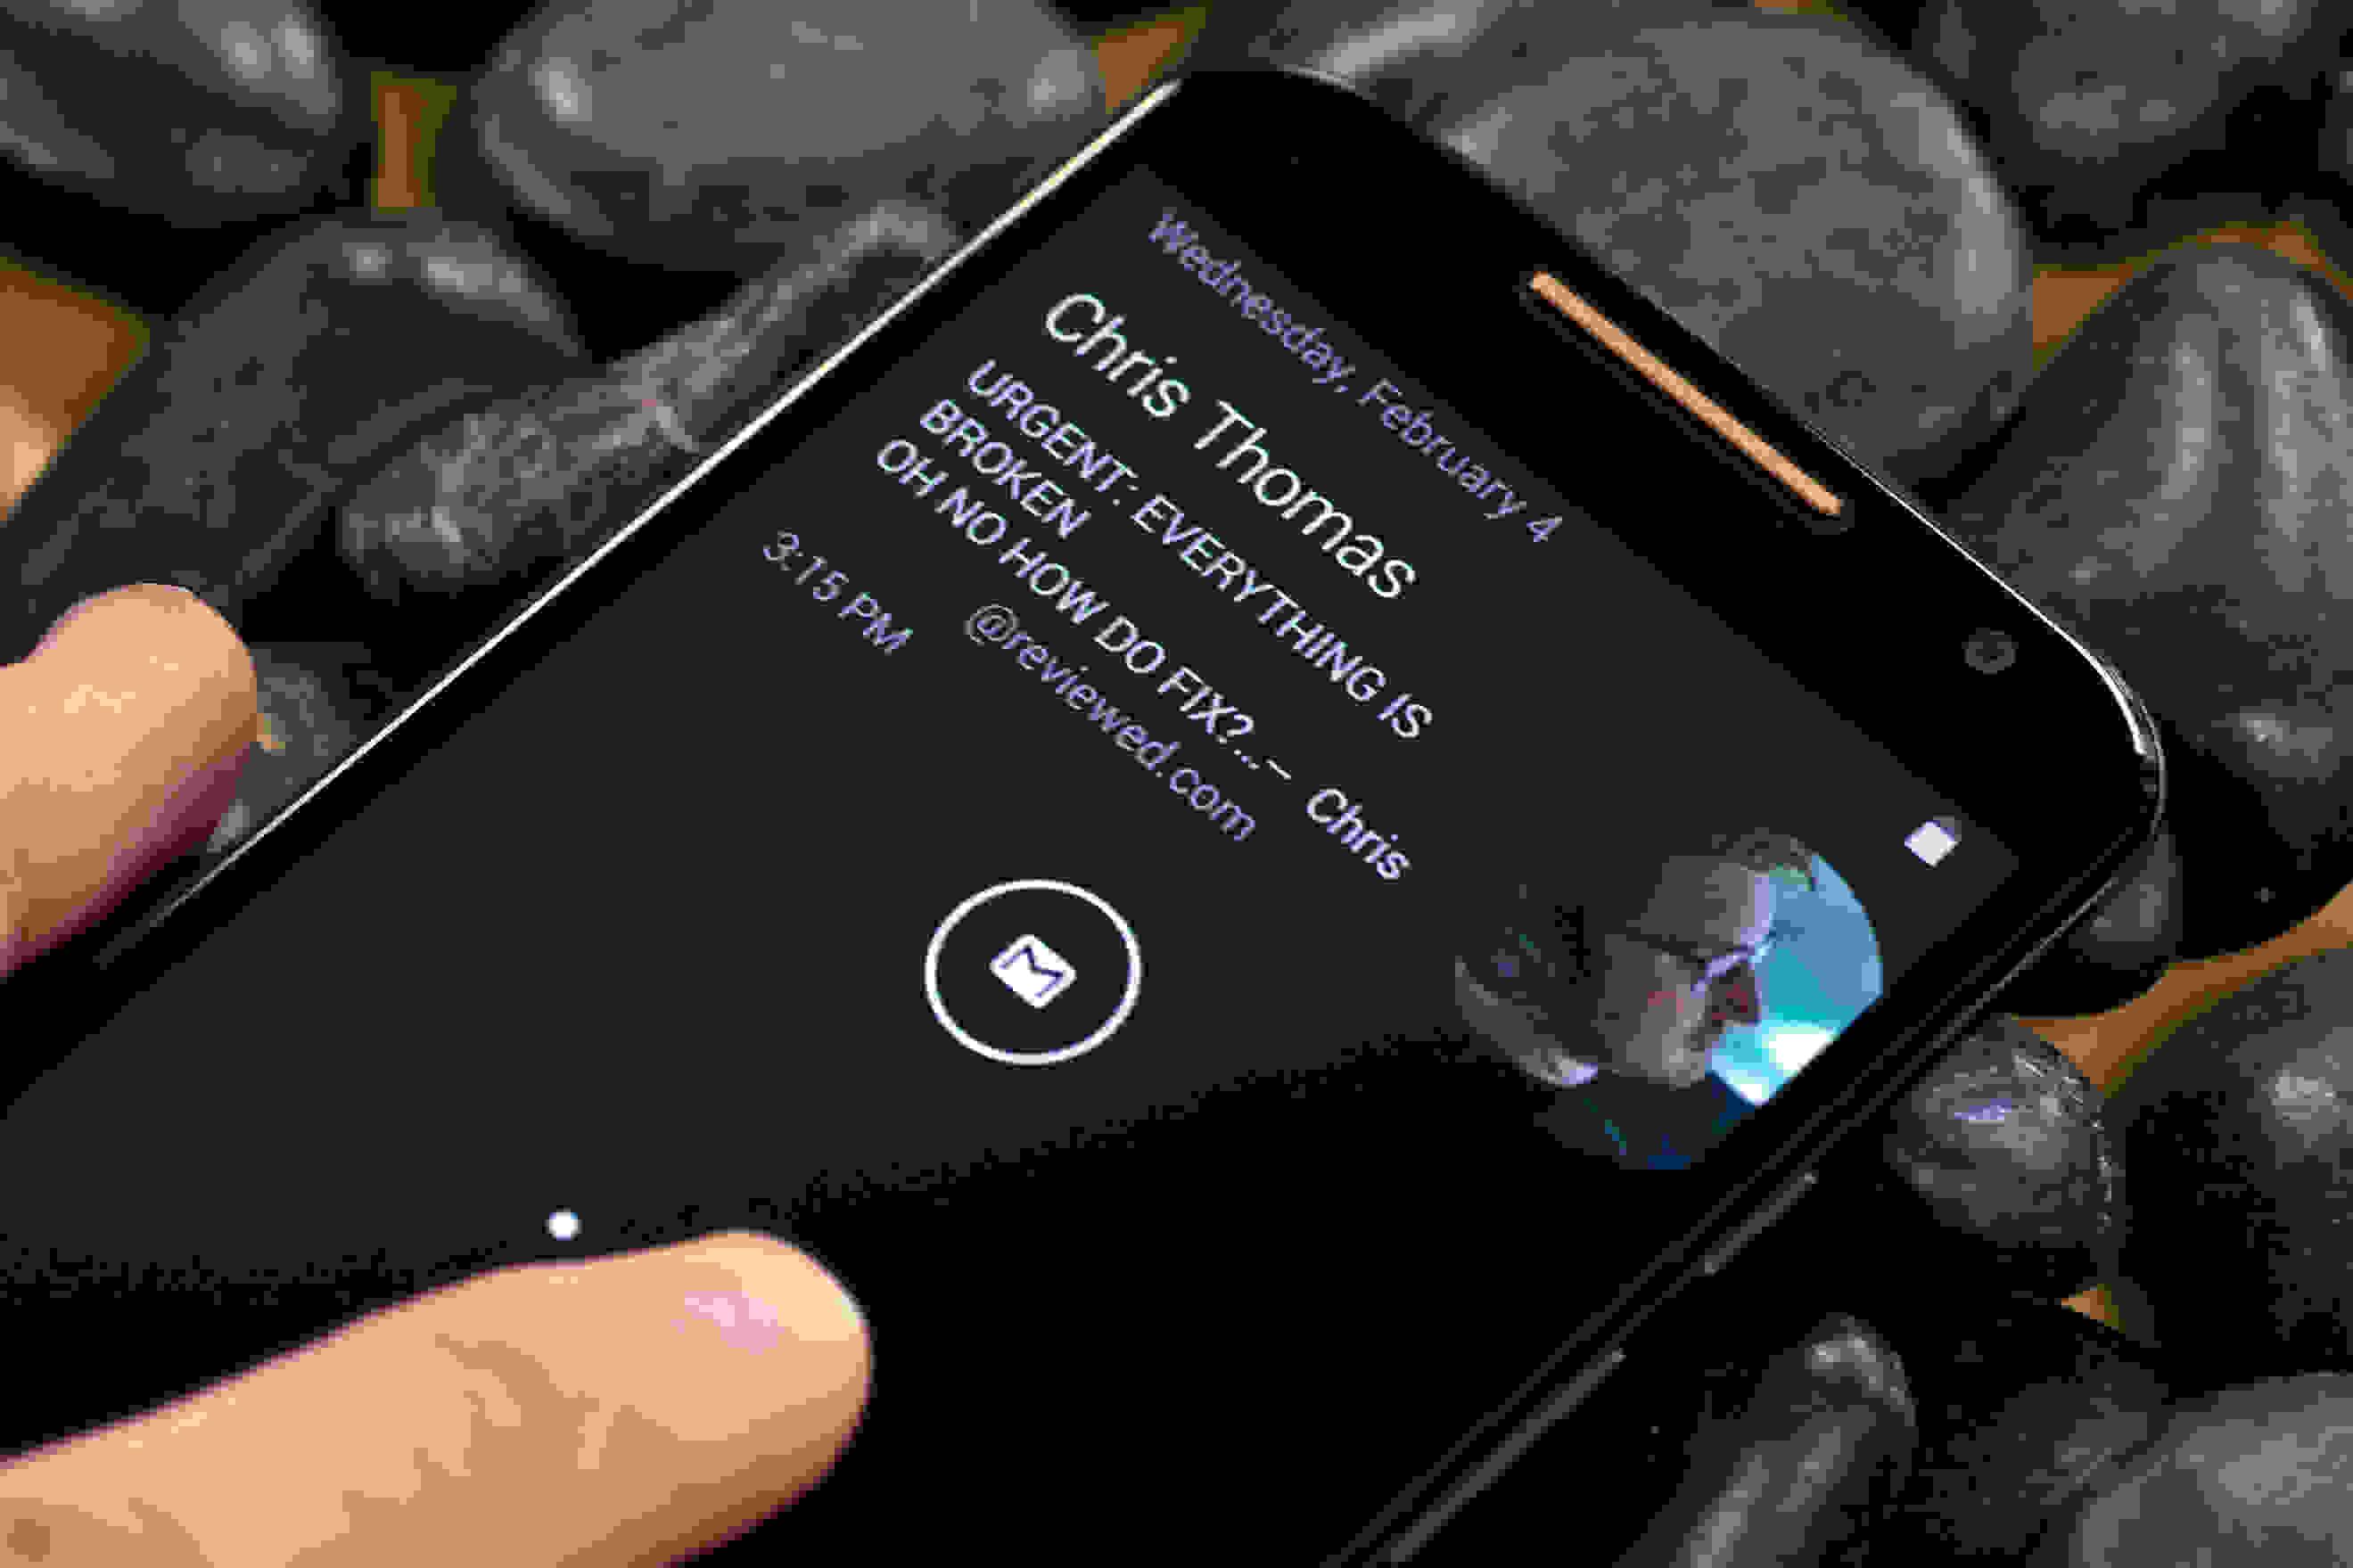 Active notifications on the Motorola Moto X (2014 edition)